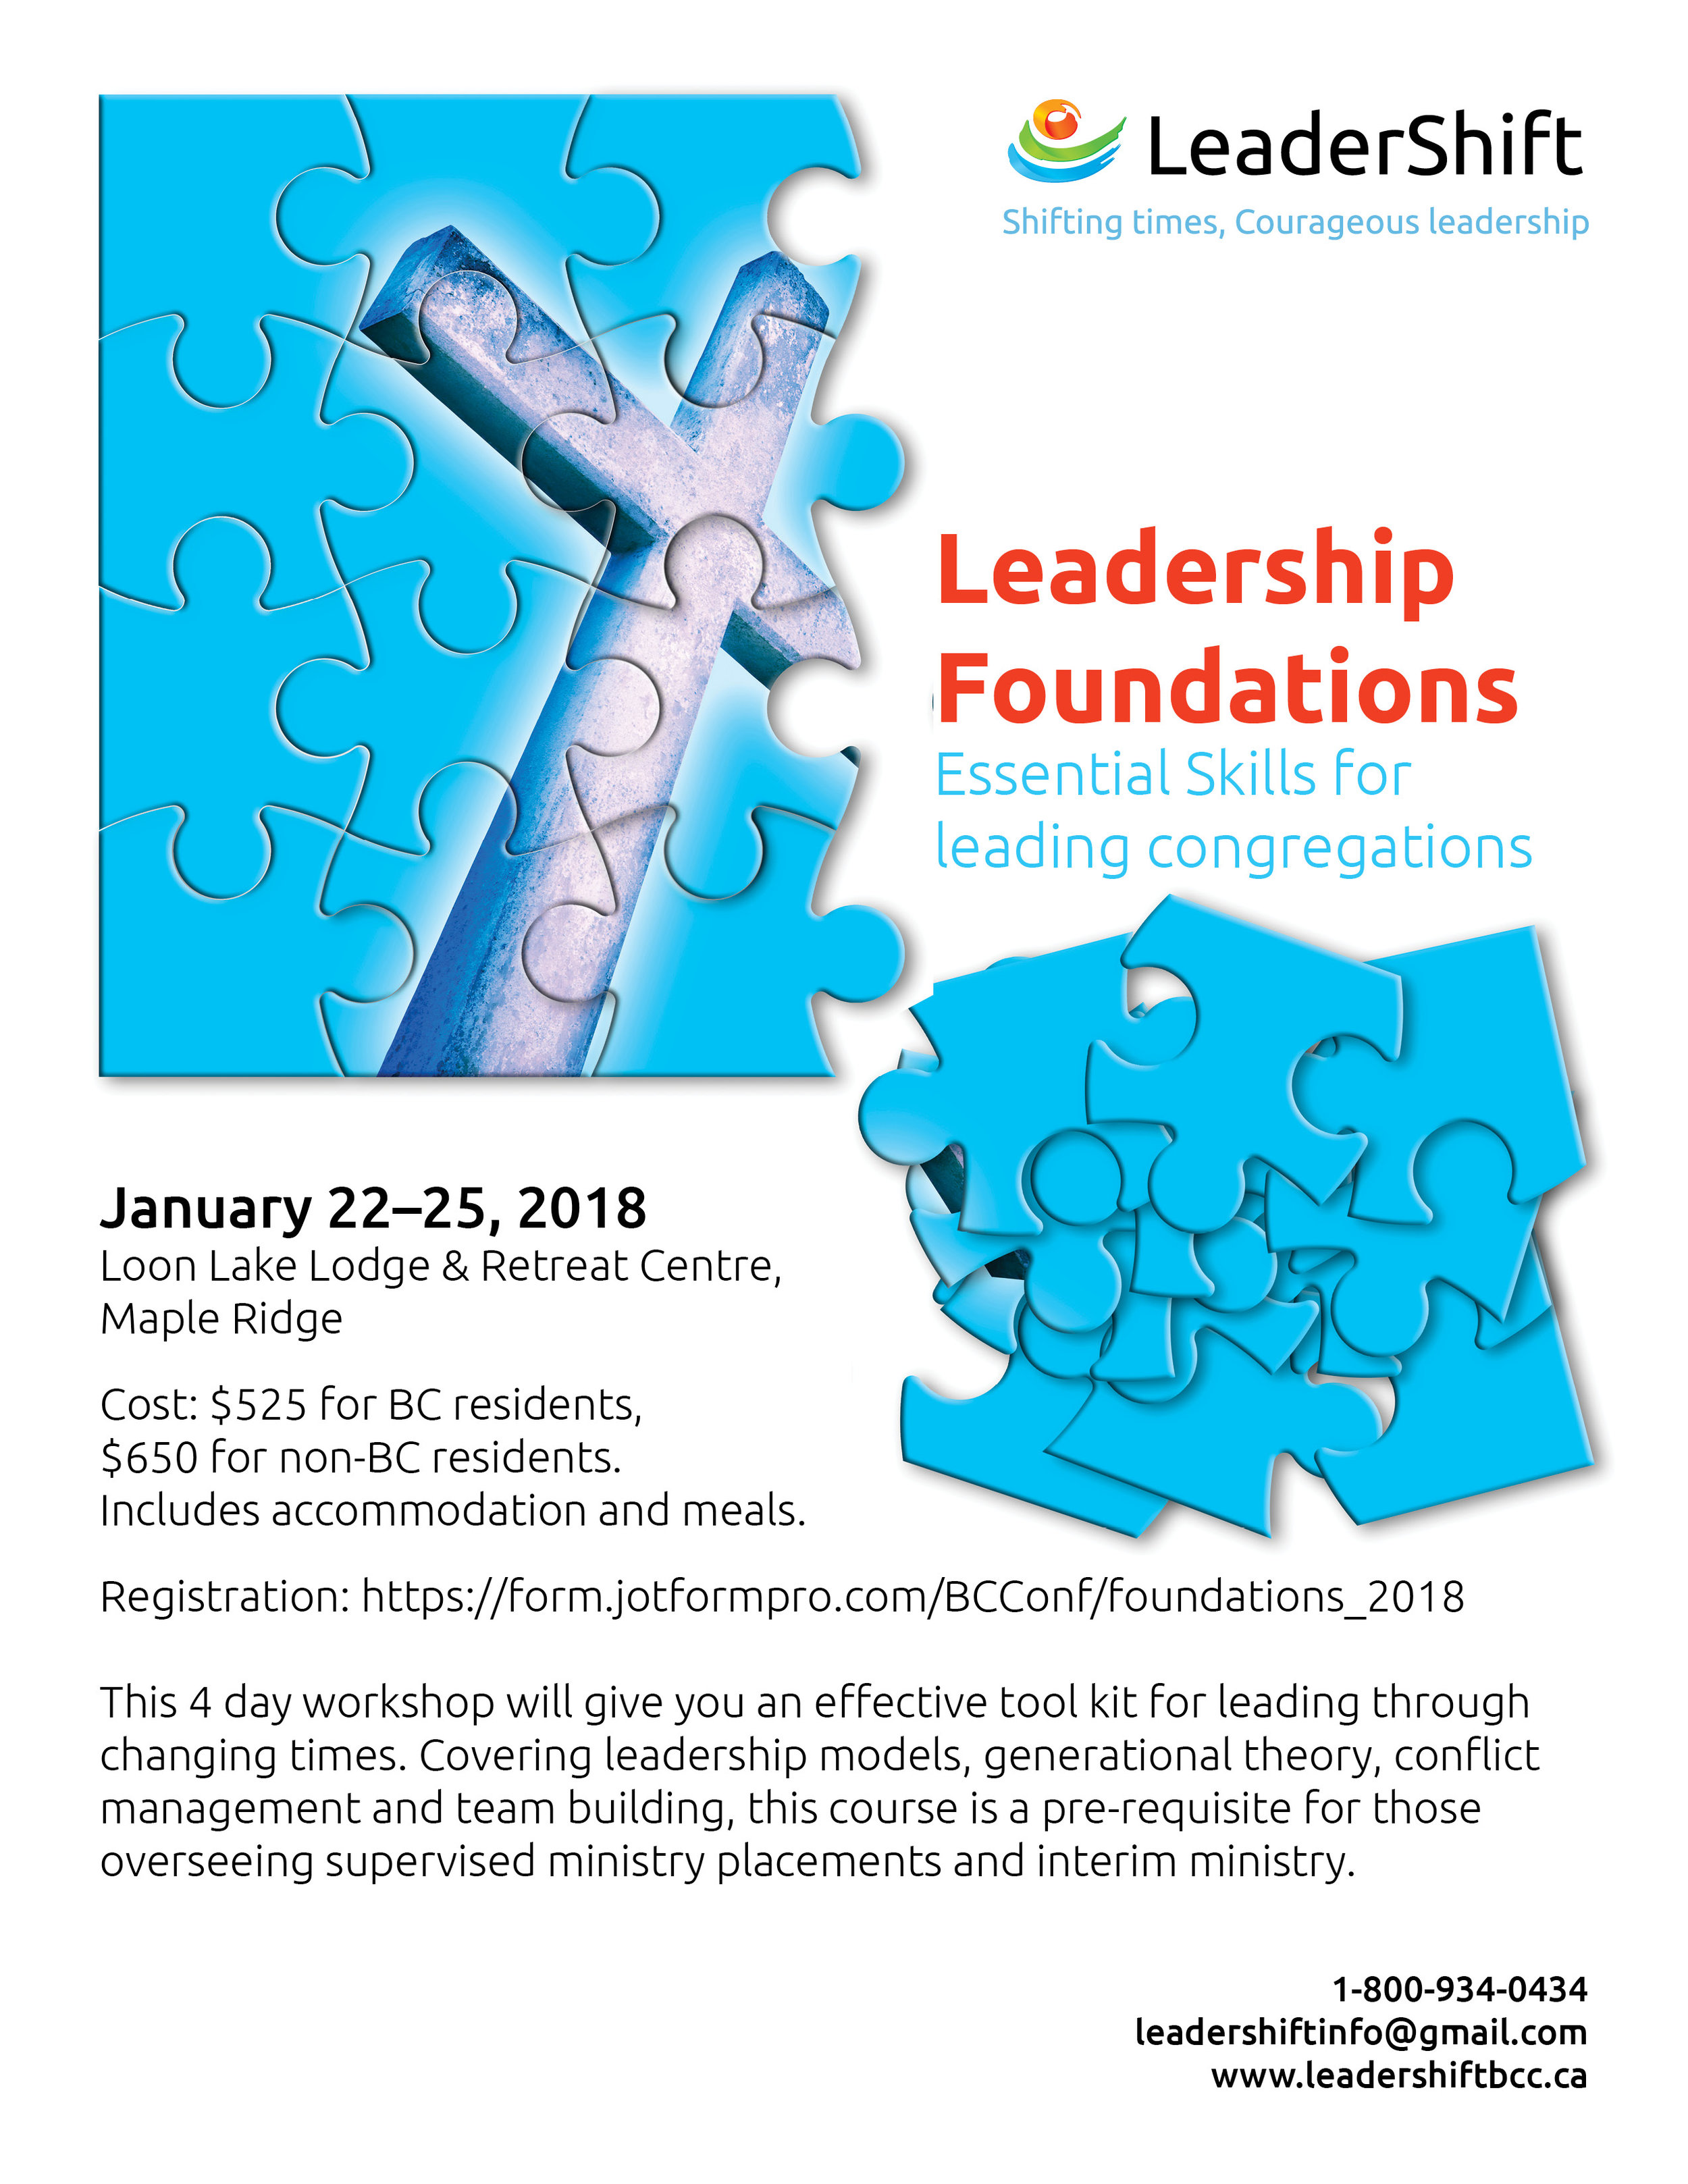 leadership-foundation-poster-v3.jpg